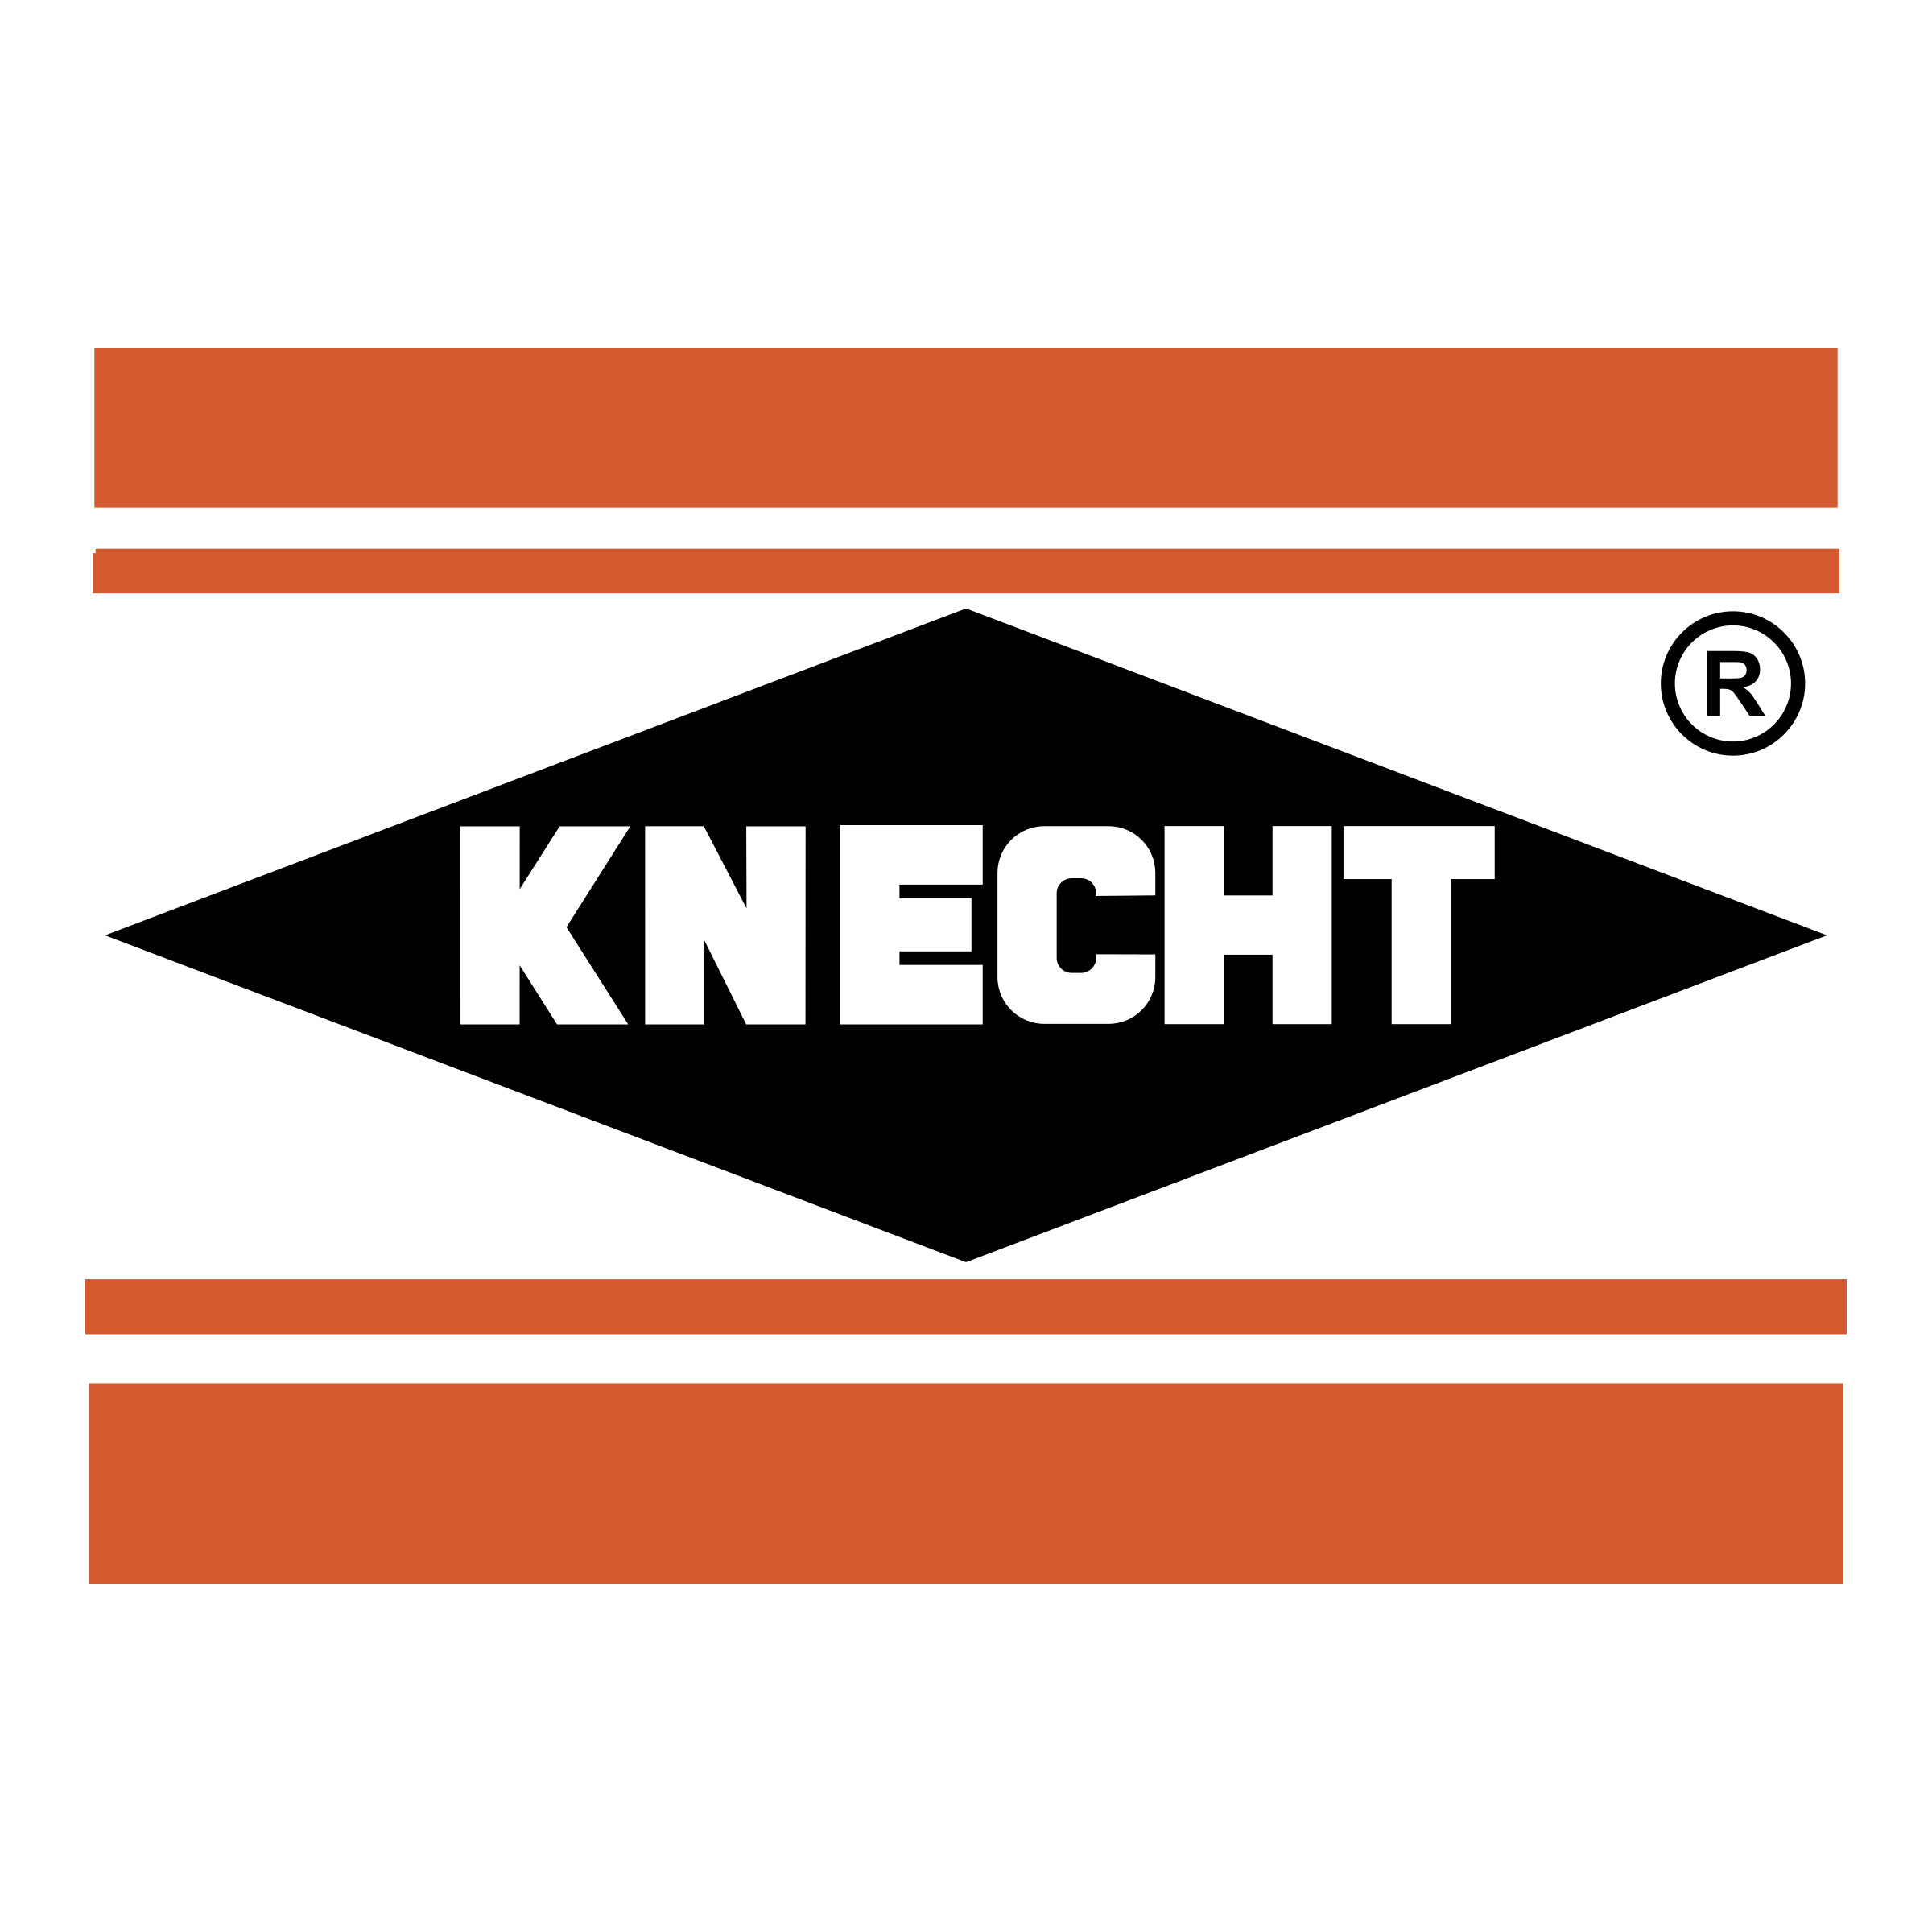 knecht-1-logo-png-transparent.png